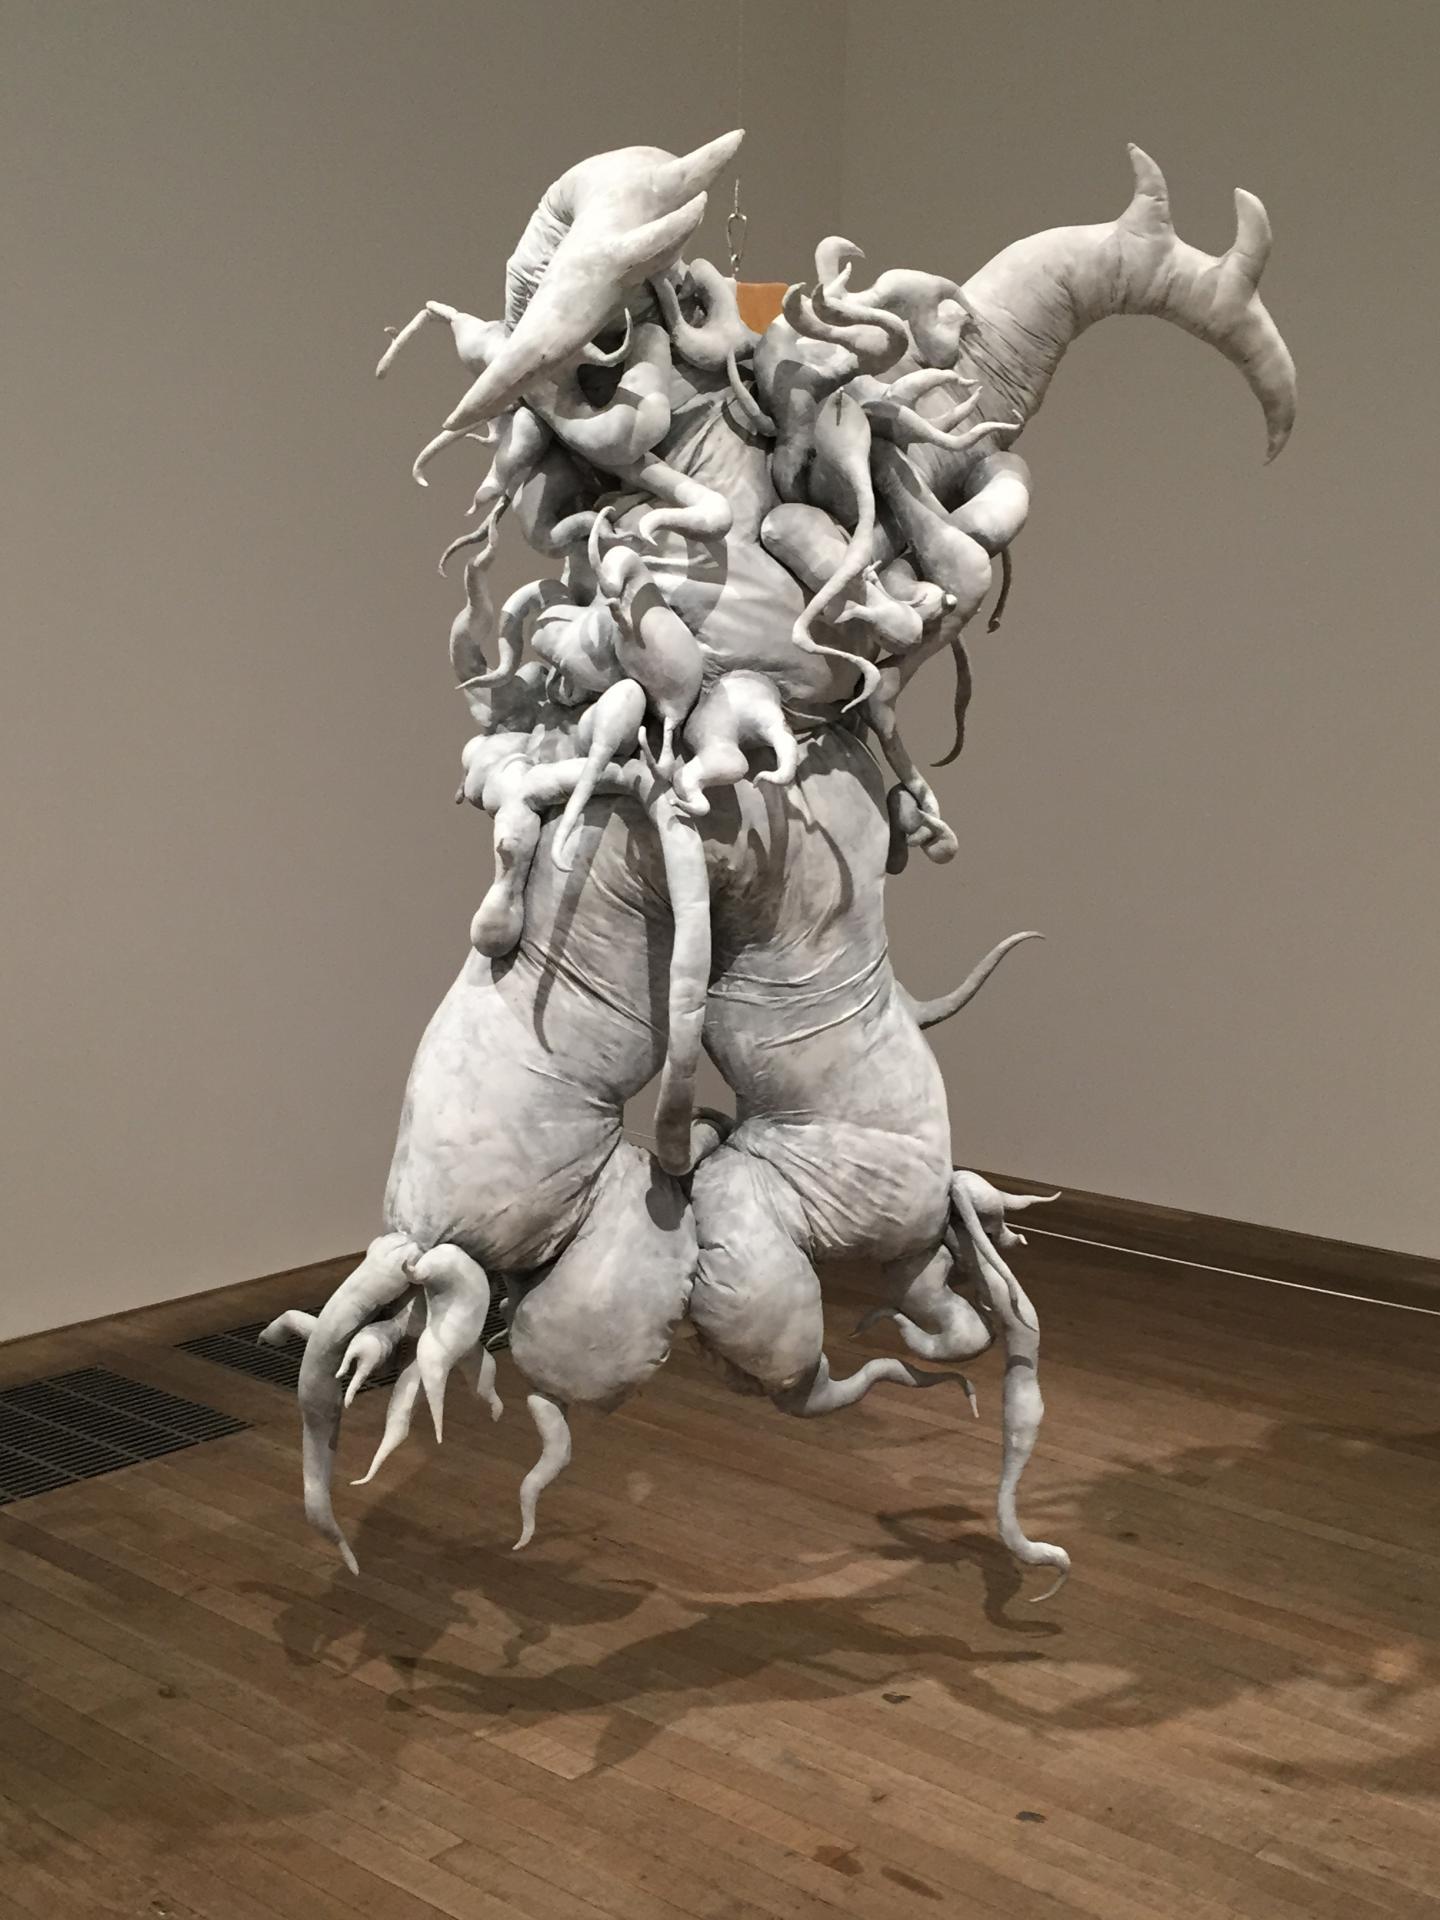 LONDRES. L'artiste coréenne Lee Bul, Tate Modern